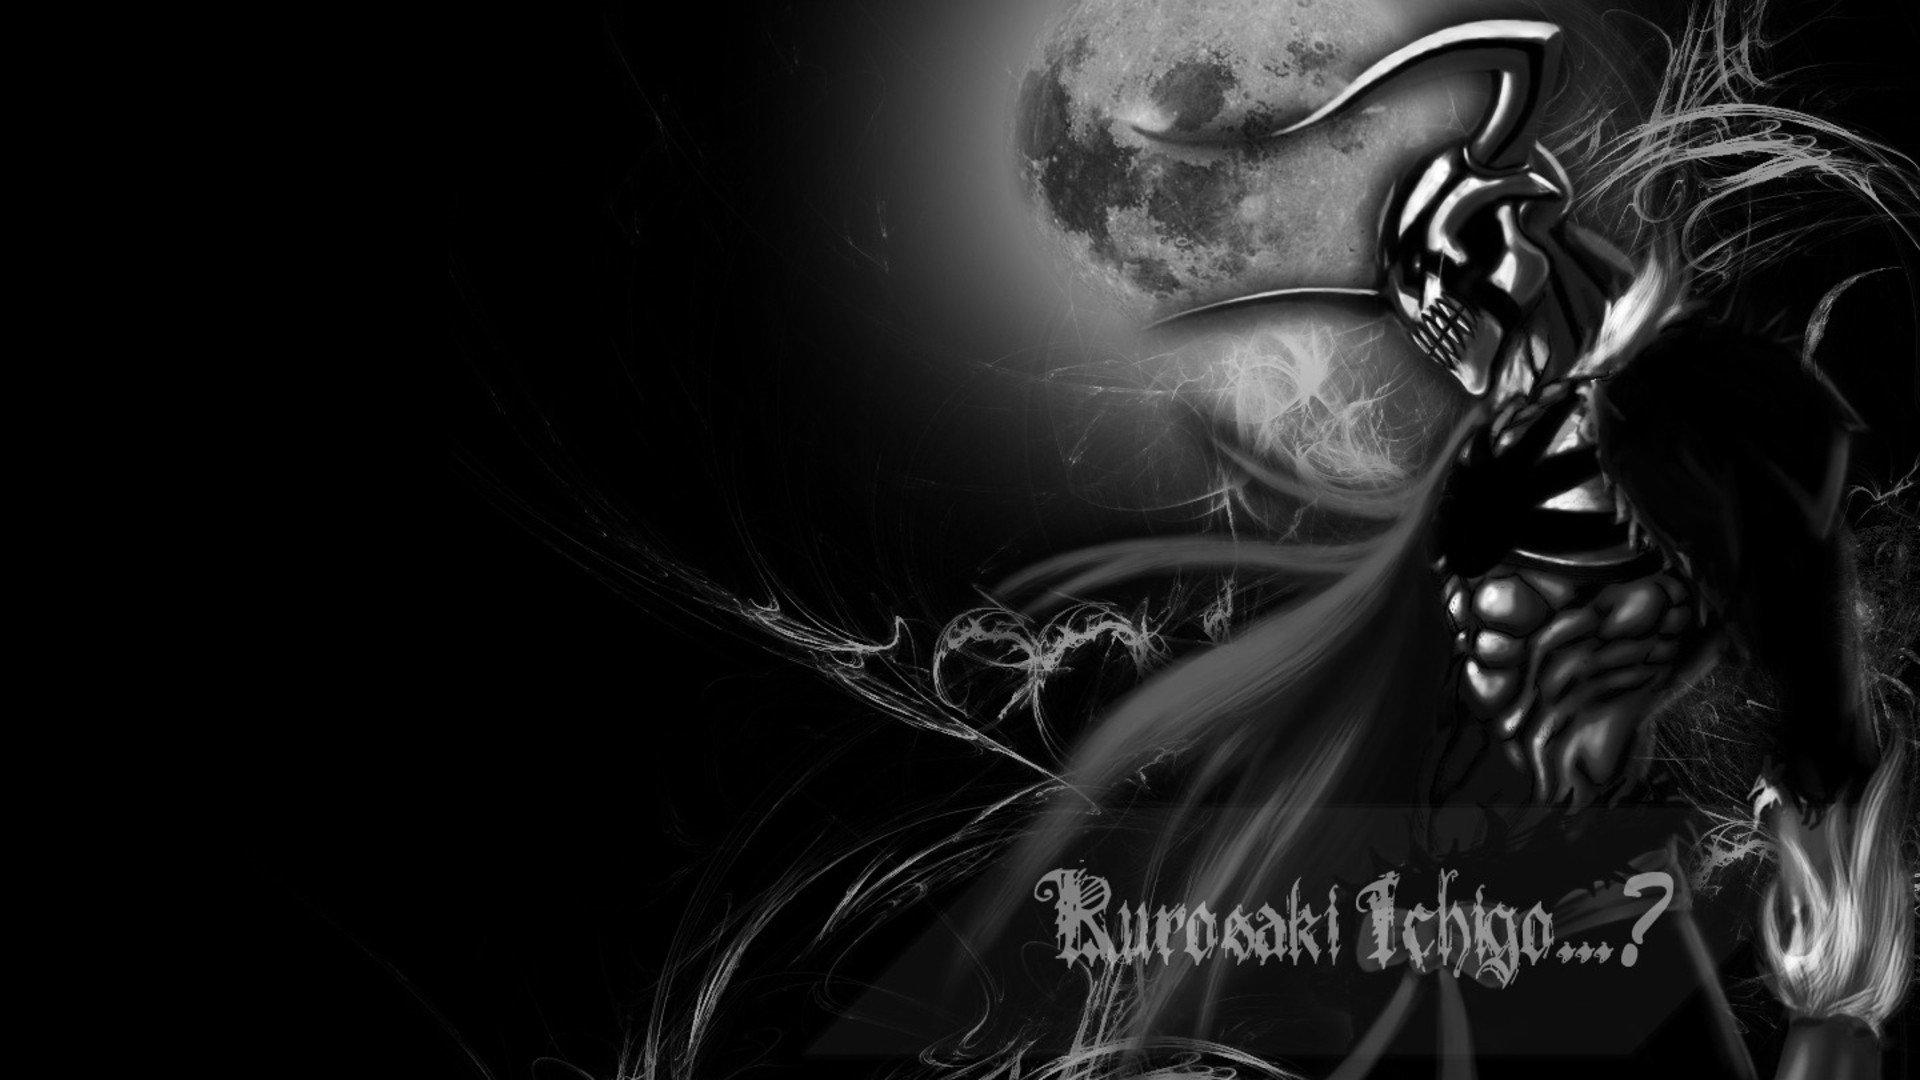 bleach moon kurosaki ichigo horns manga hollow ichigo vastolorde